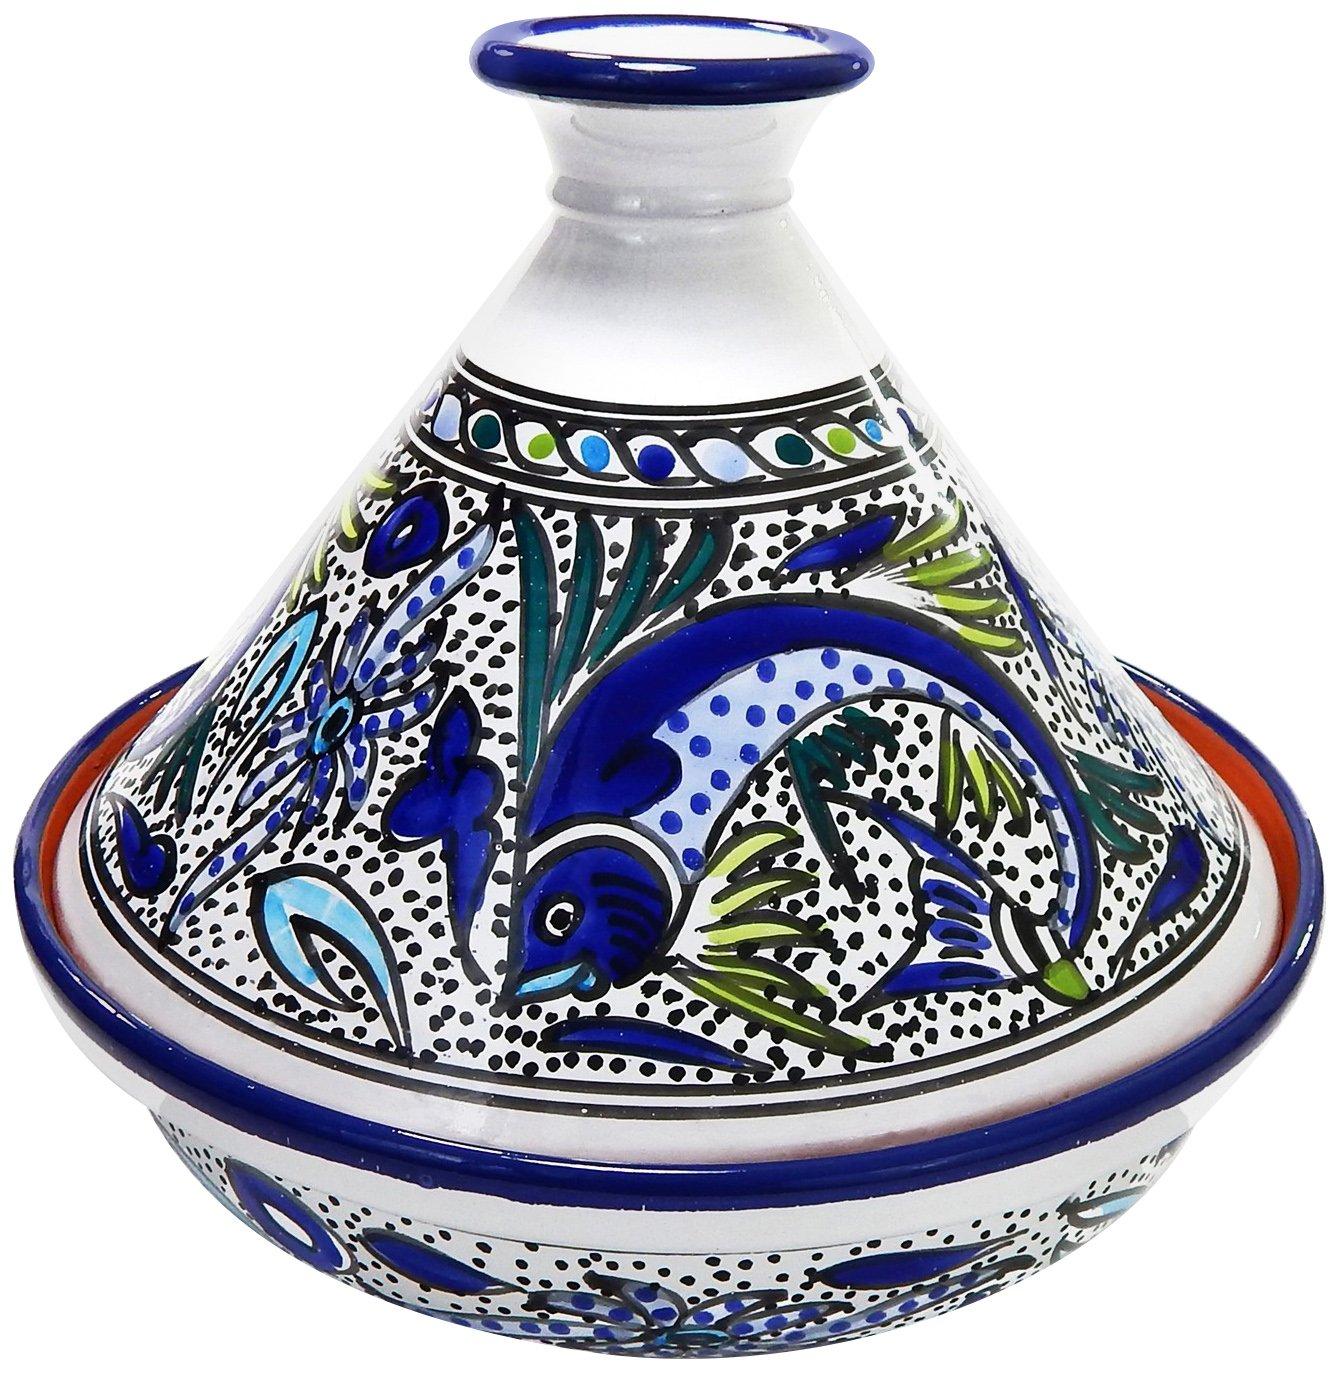 Le Souk Ceramique AF20CT Cookable Tagine 12 Inch, Aqua Fish, Large AFCT20